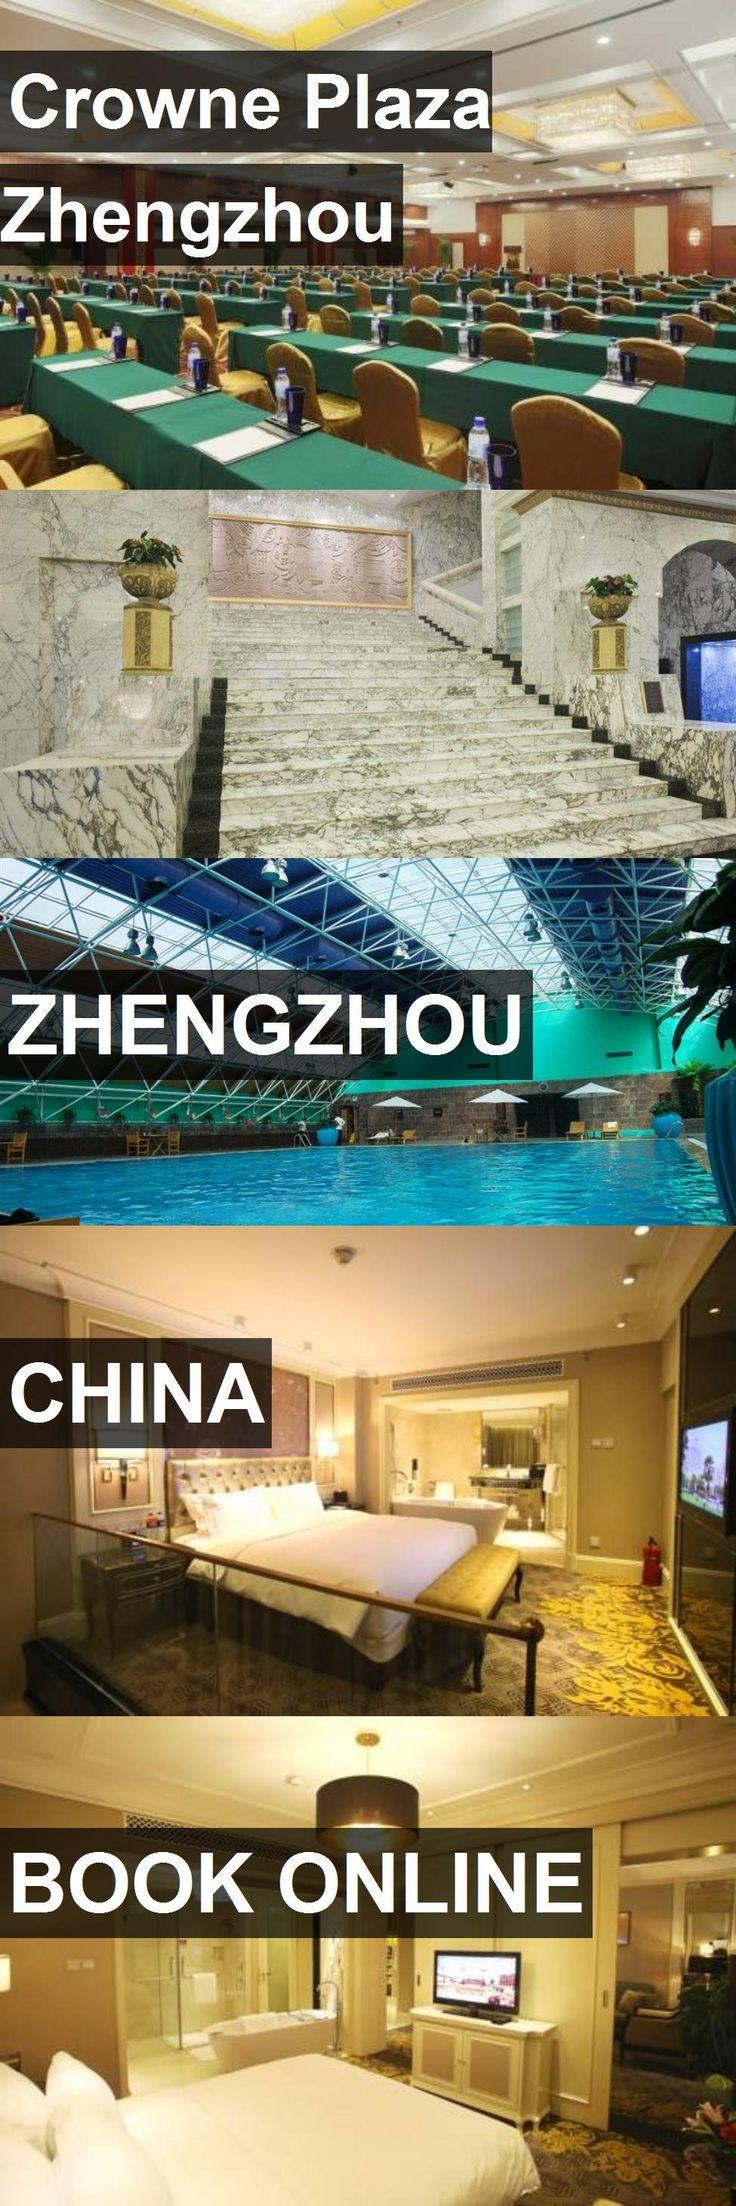 Hotel Crowne Plaza Zhengzhou in Zhengzhou, China. For more information, photos, reviews and best prices please follow the link. #China #Zhengzhou #travel #vacation #hotel